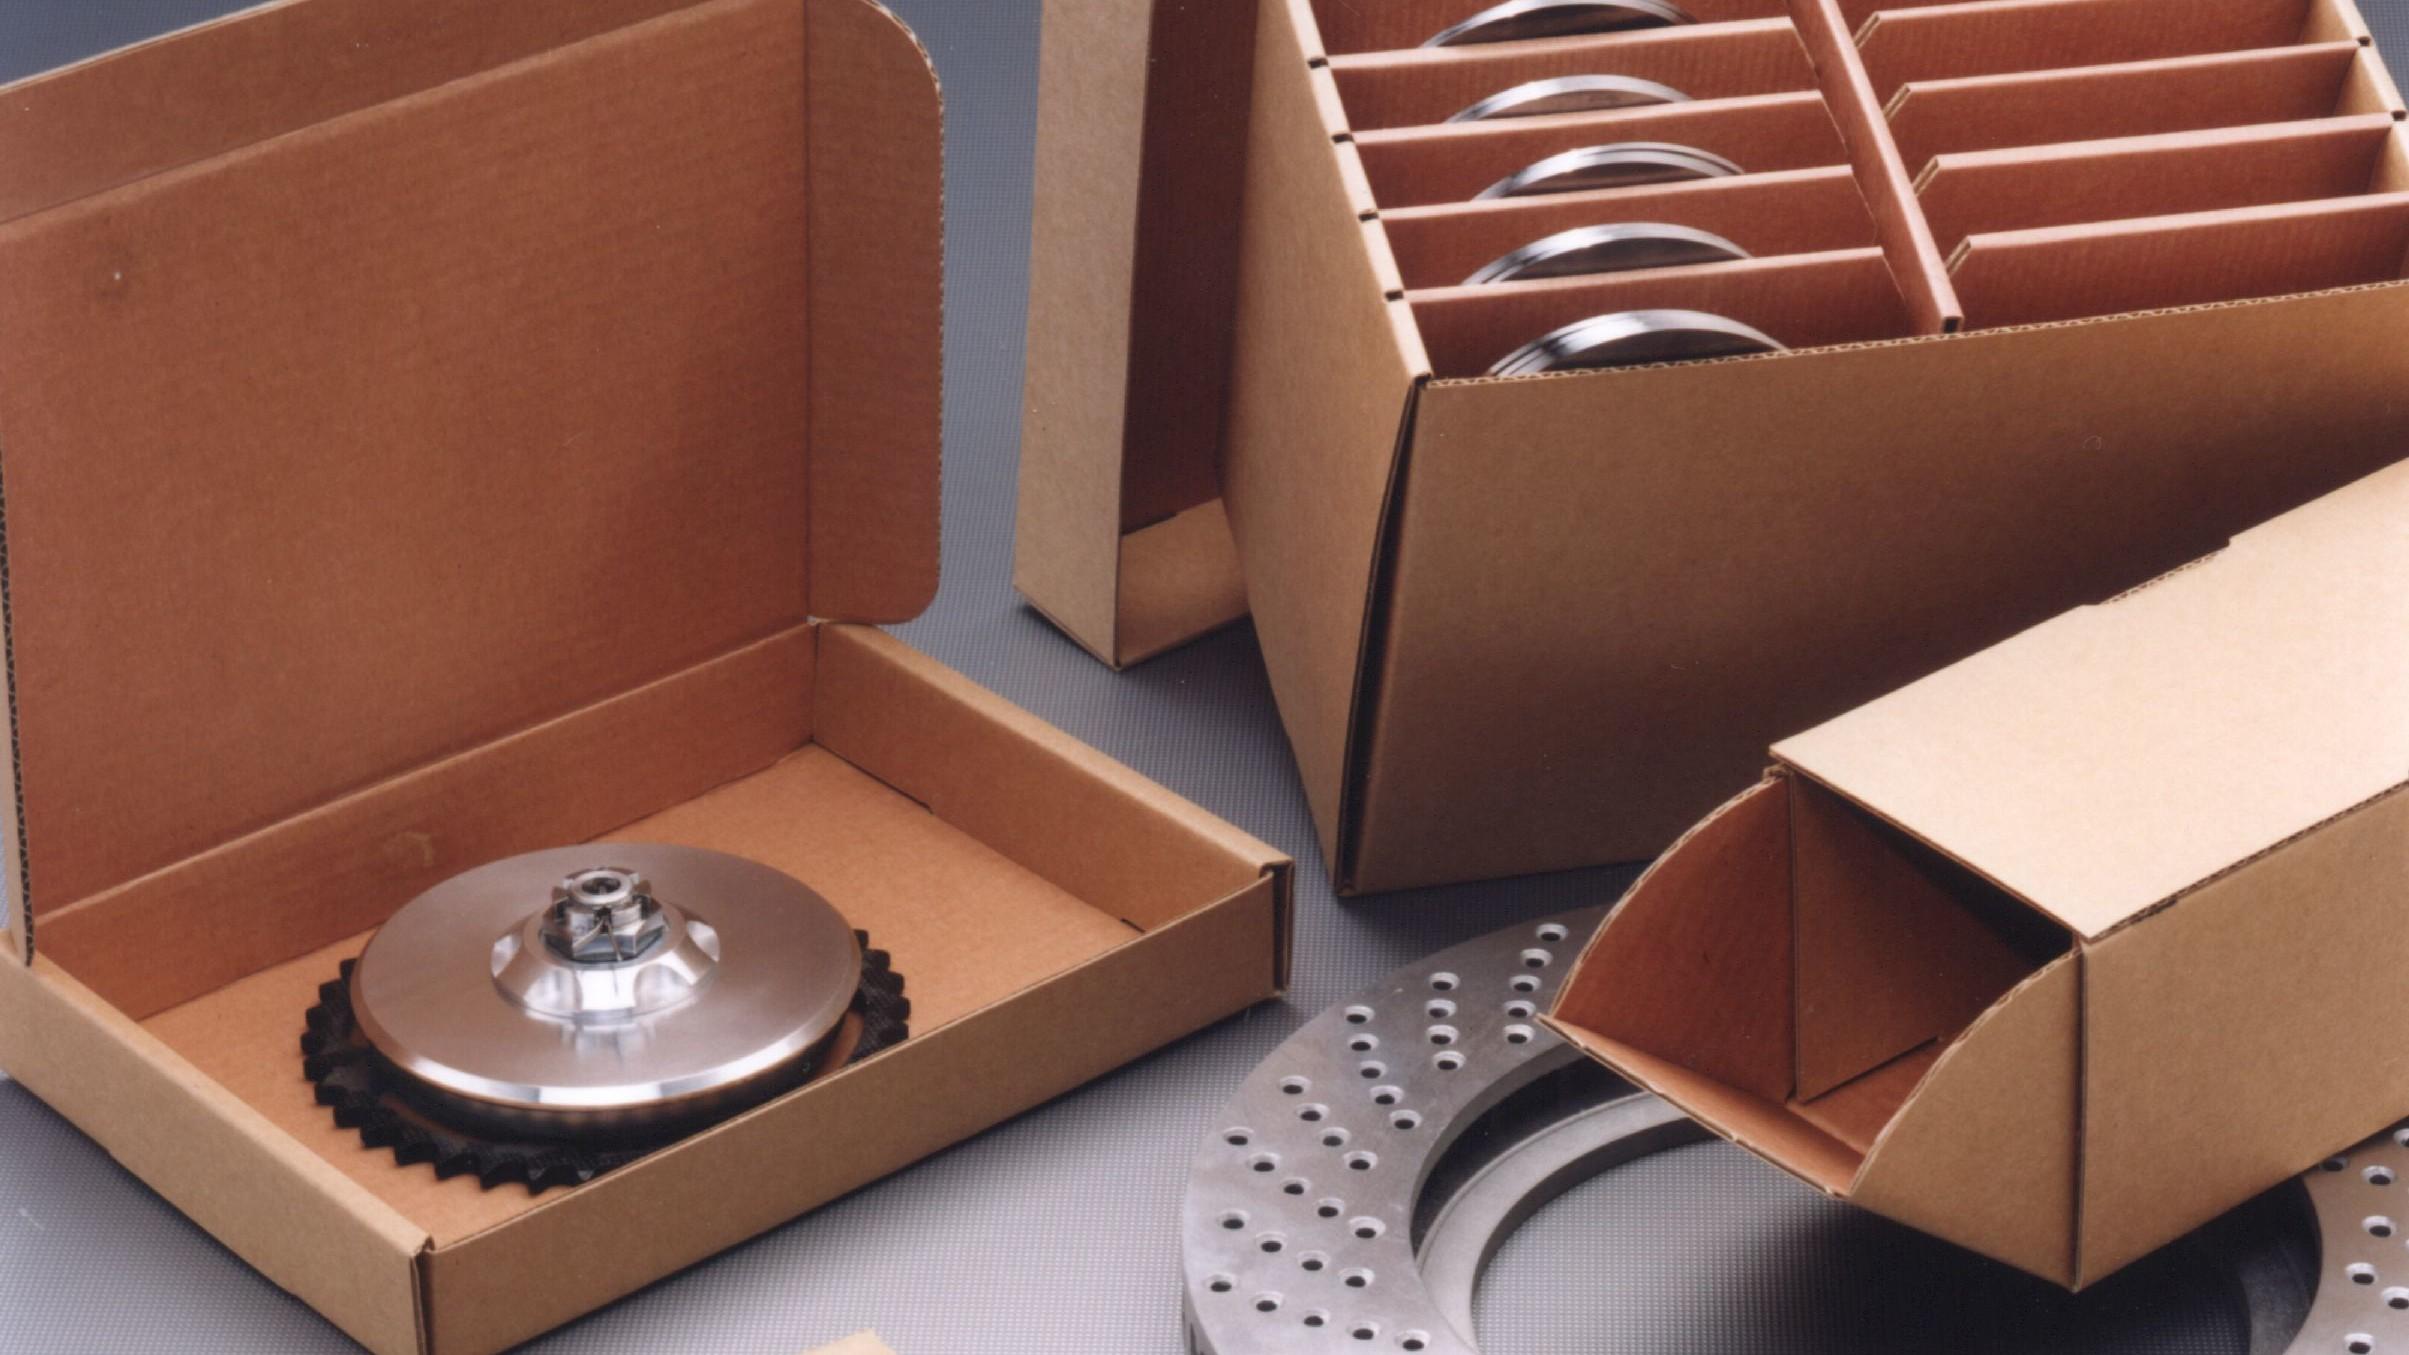 Signier-/Schablonenkarton Verpackung Korrosionsschutz Nawrot AG